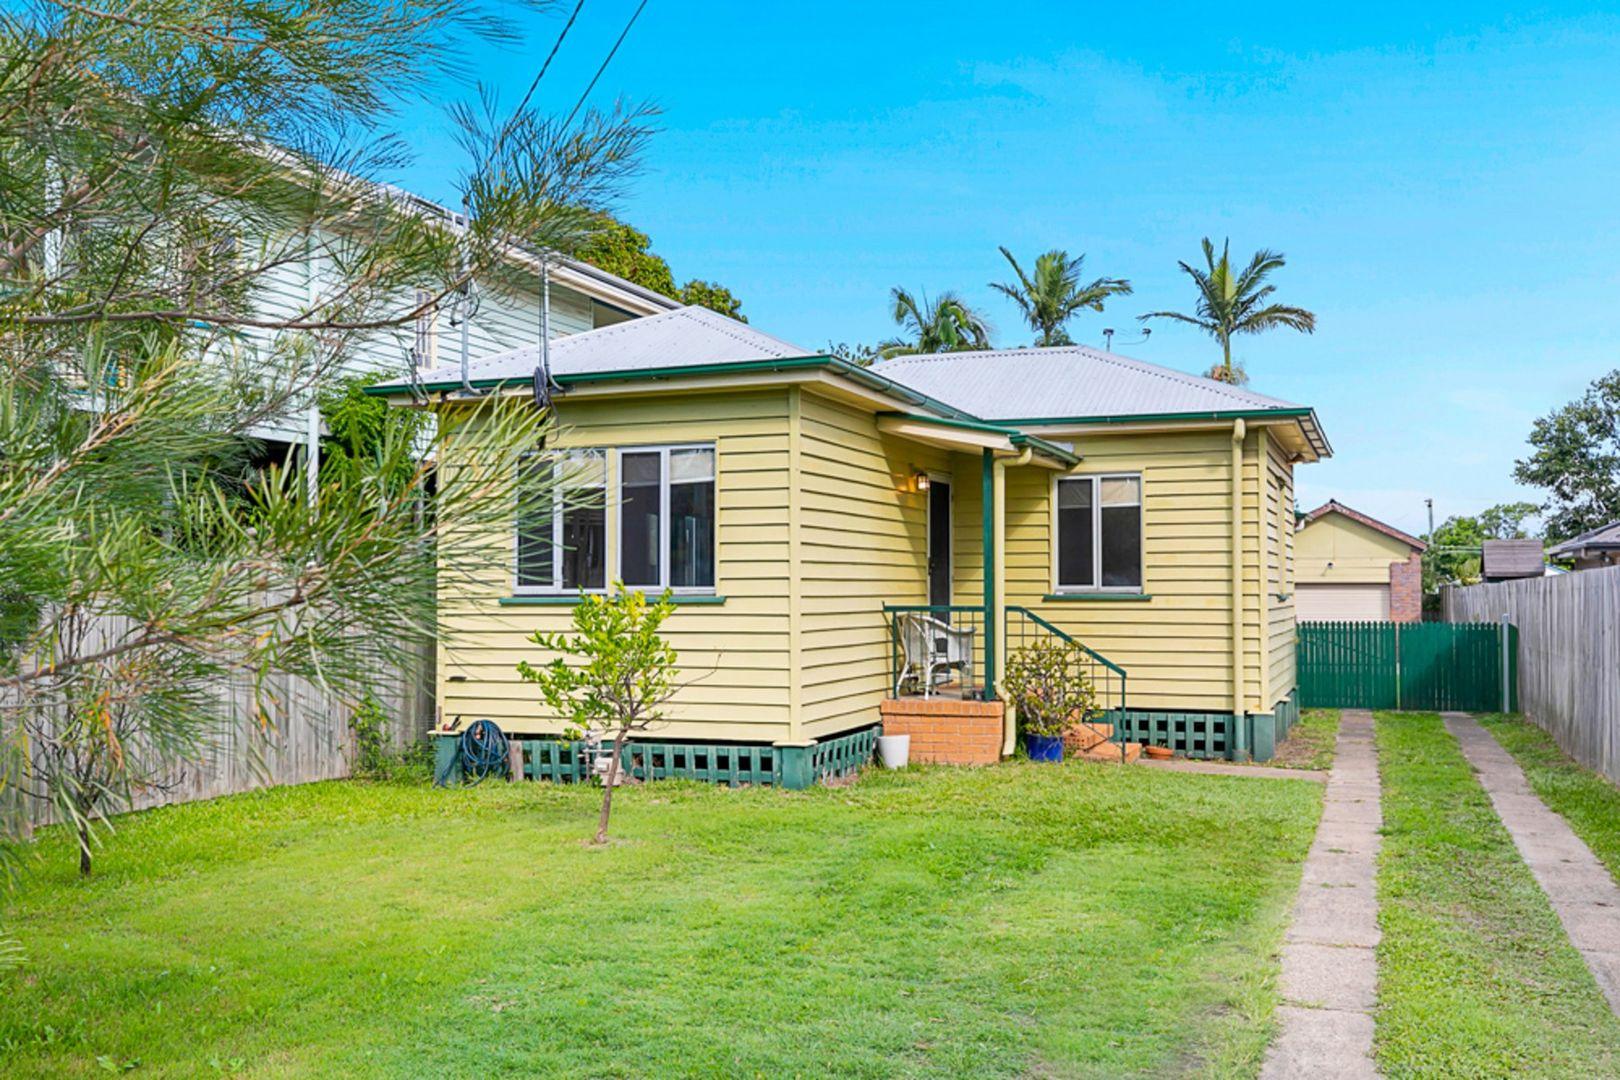 54 Uplands Terrace, Wynnum QLD 4178, Image 0